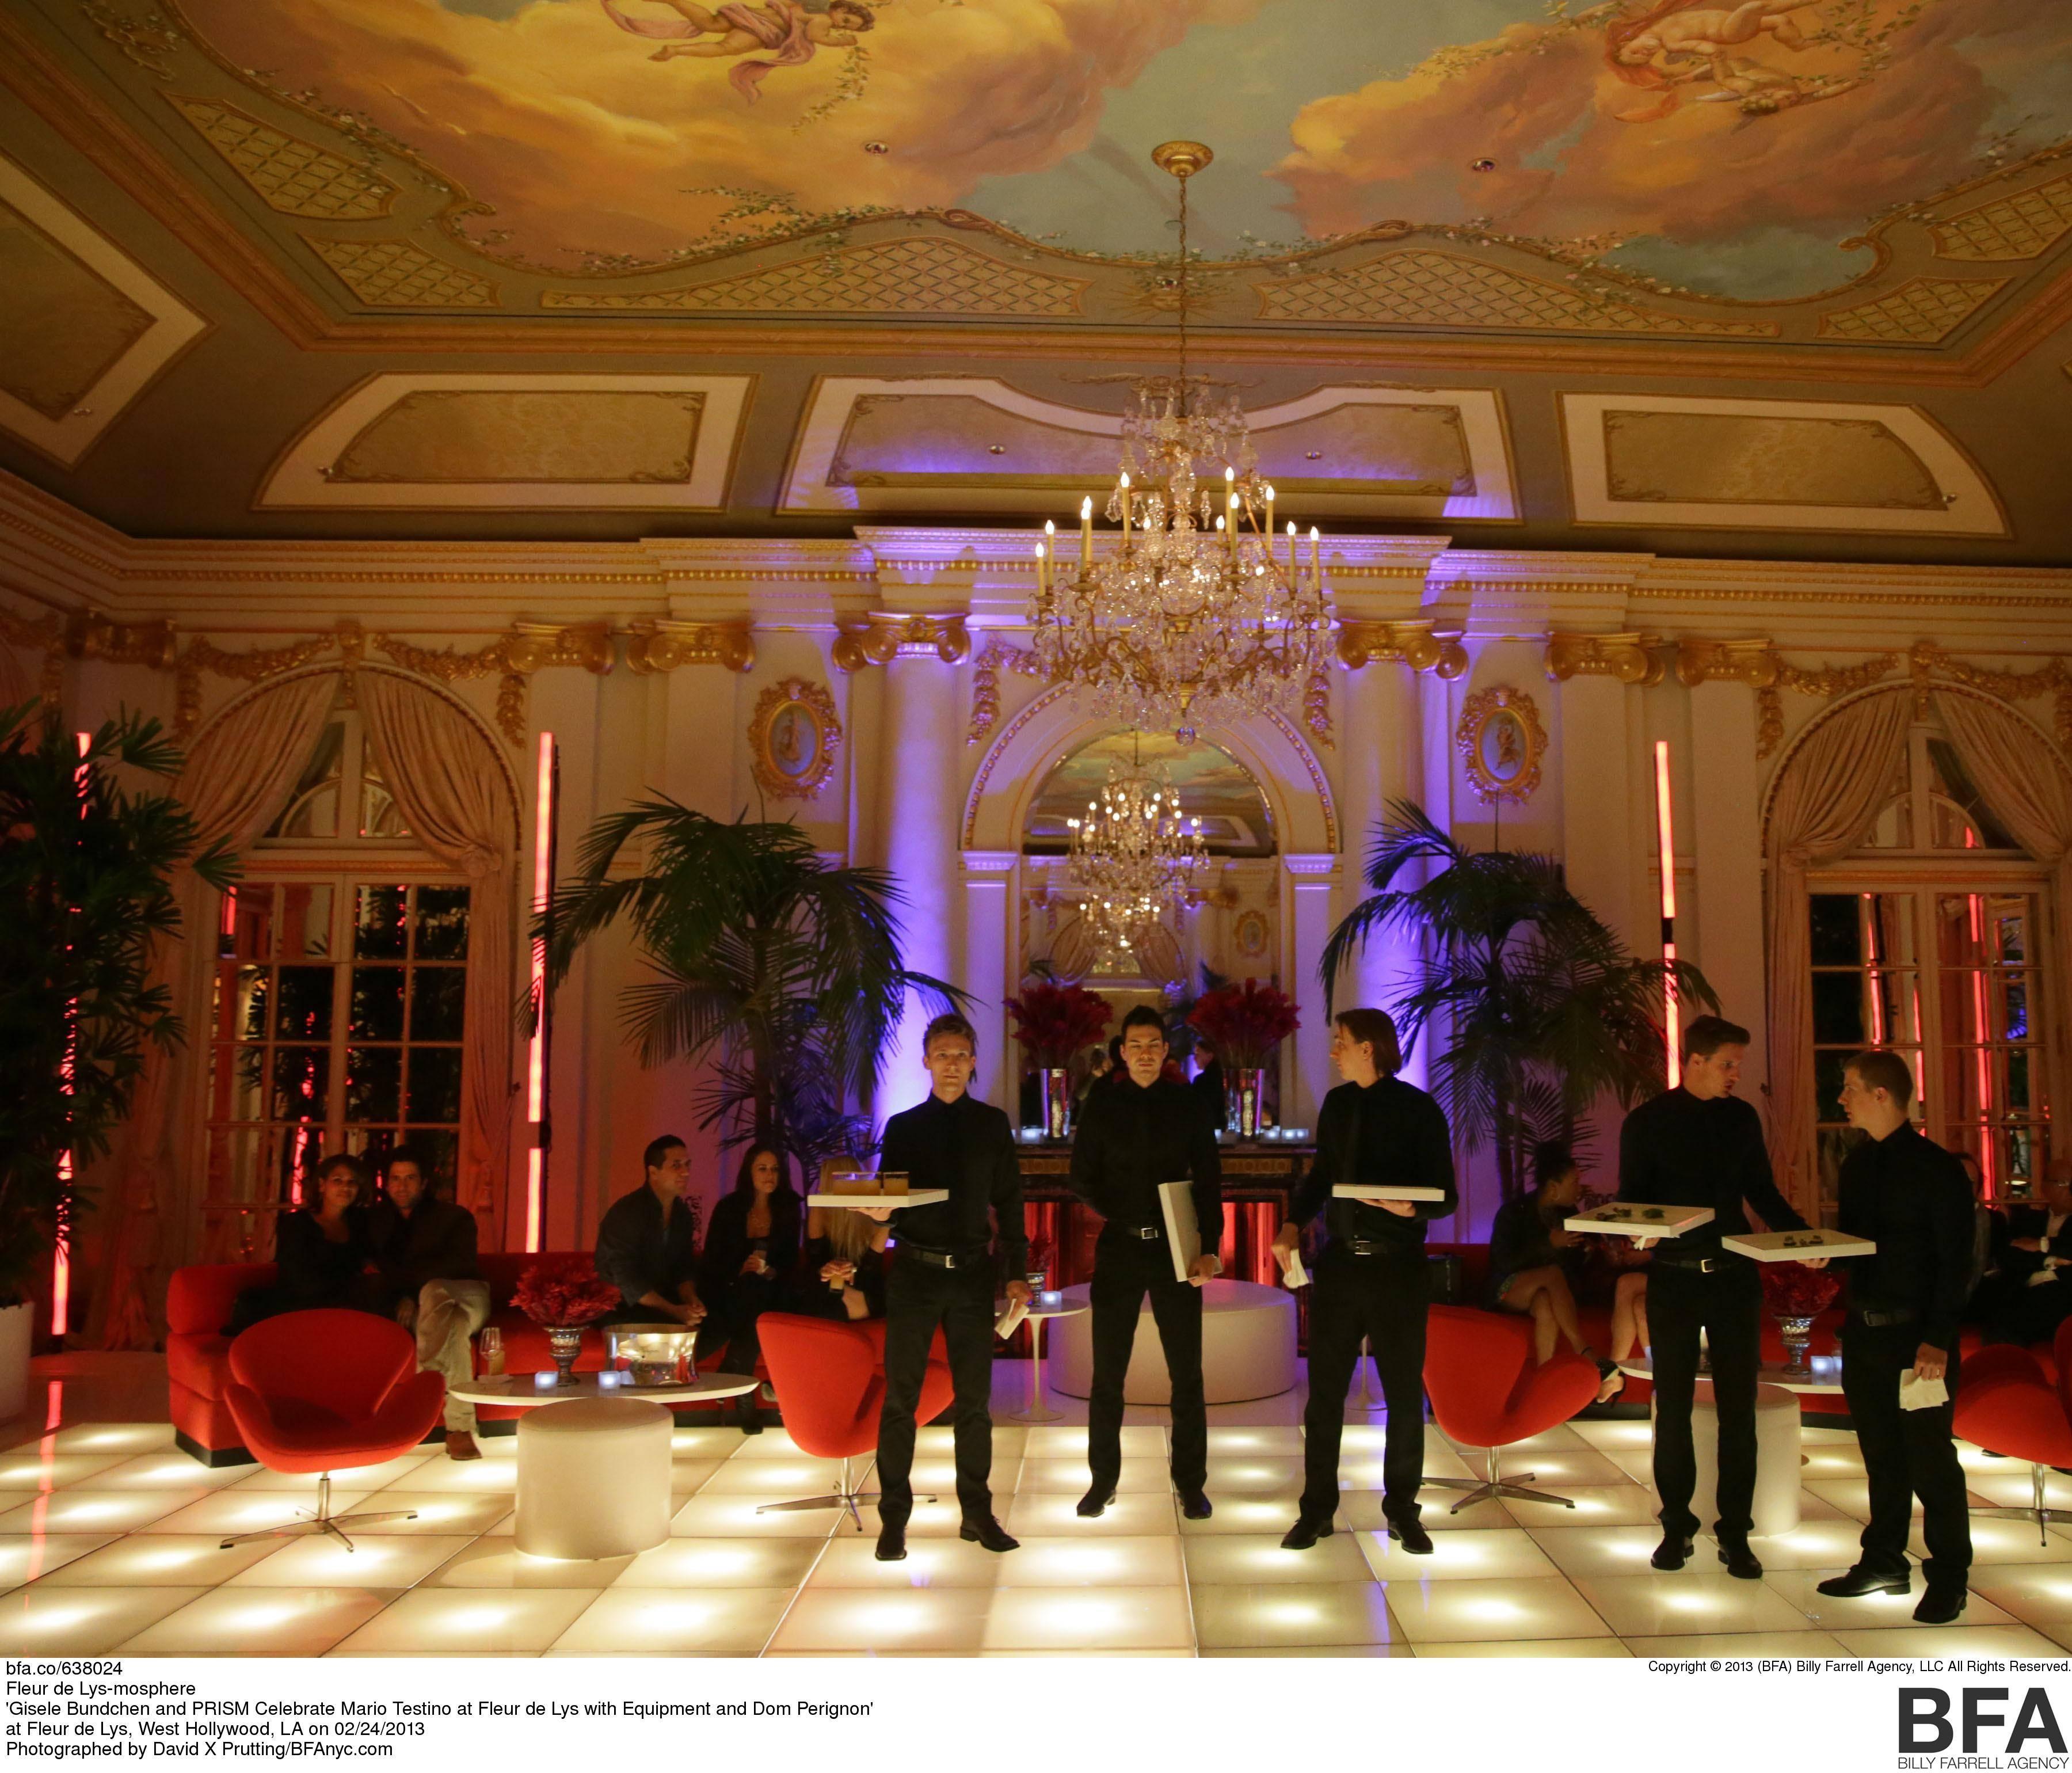 Gisele Bundchen and PRISM Celebrate Mario Testino at Fleur de Lys with Equipment and Dom Perignon